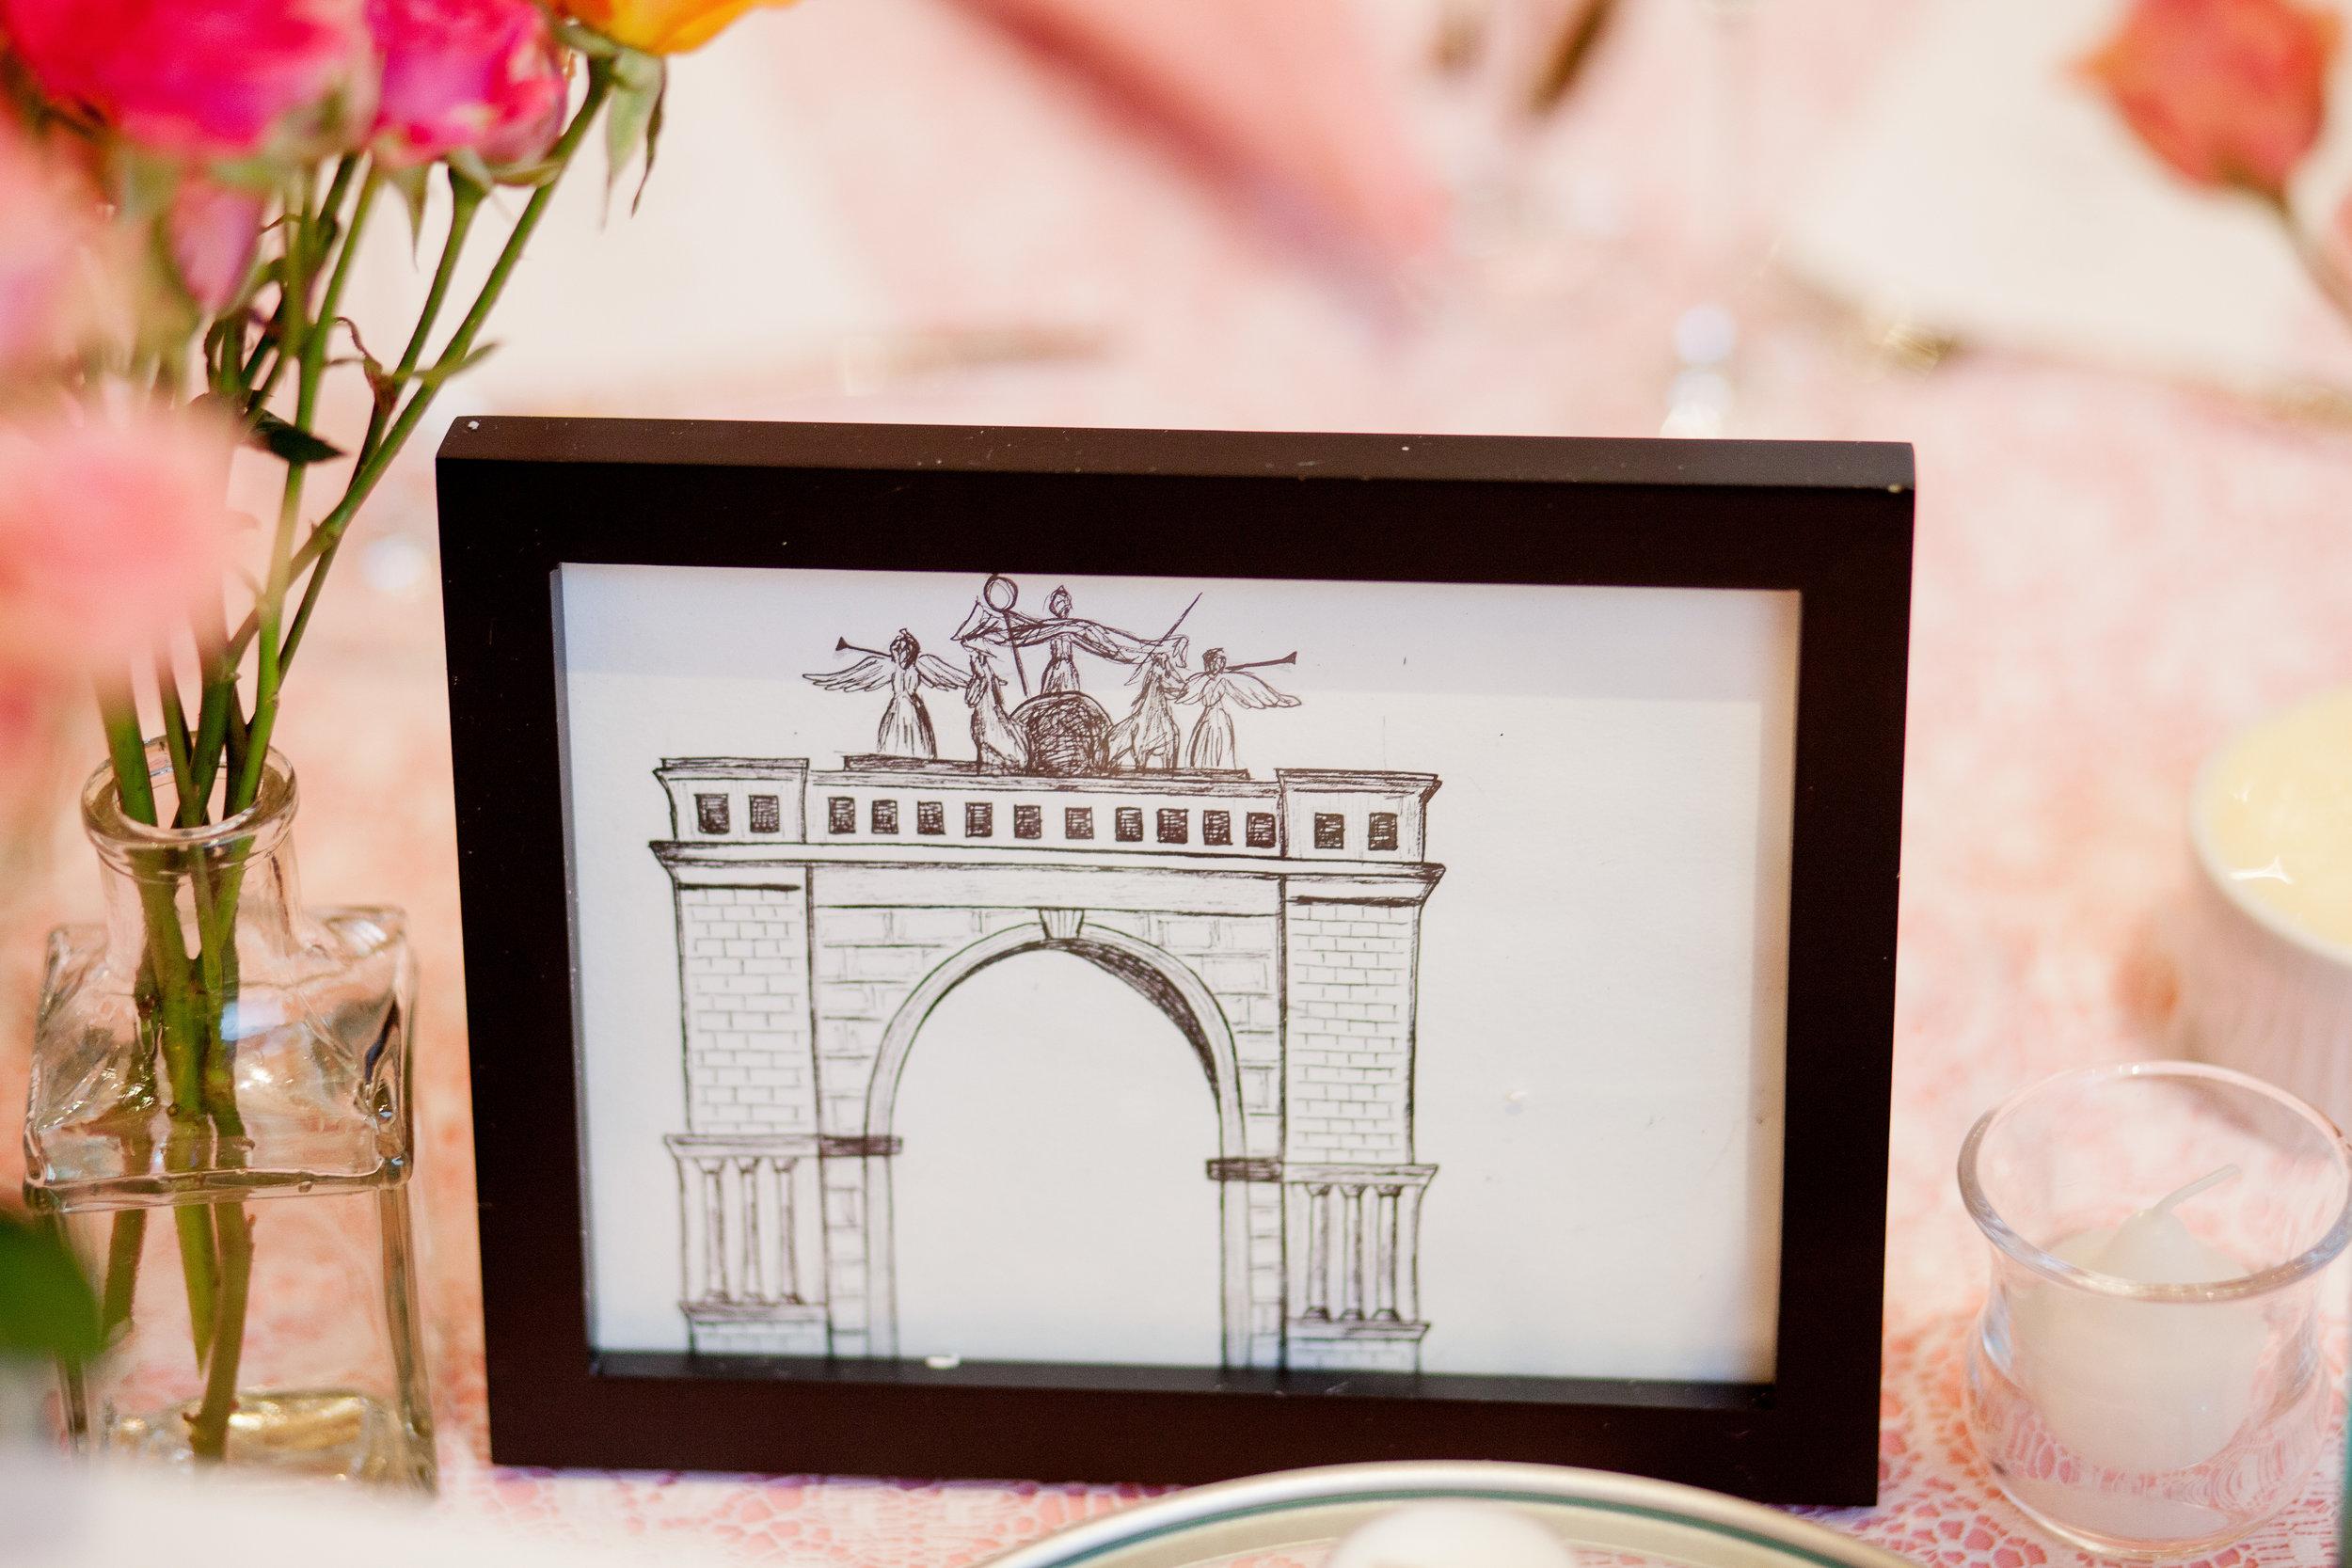 Pineapple Street Designs Stationery Illustrations for Weddings (22).jpg